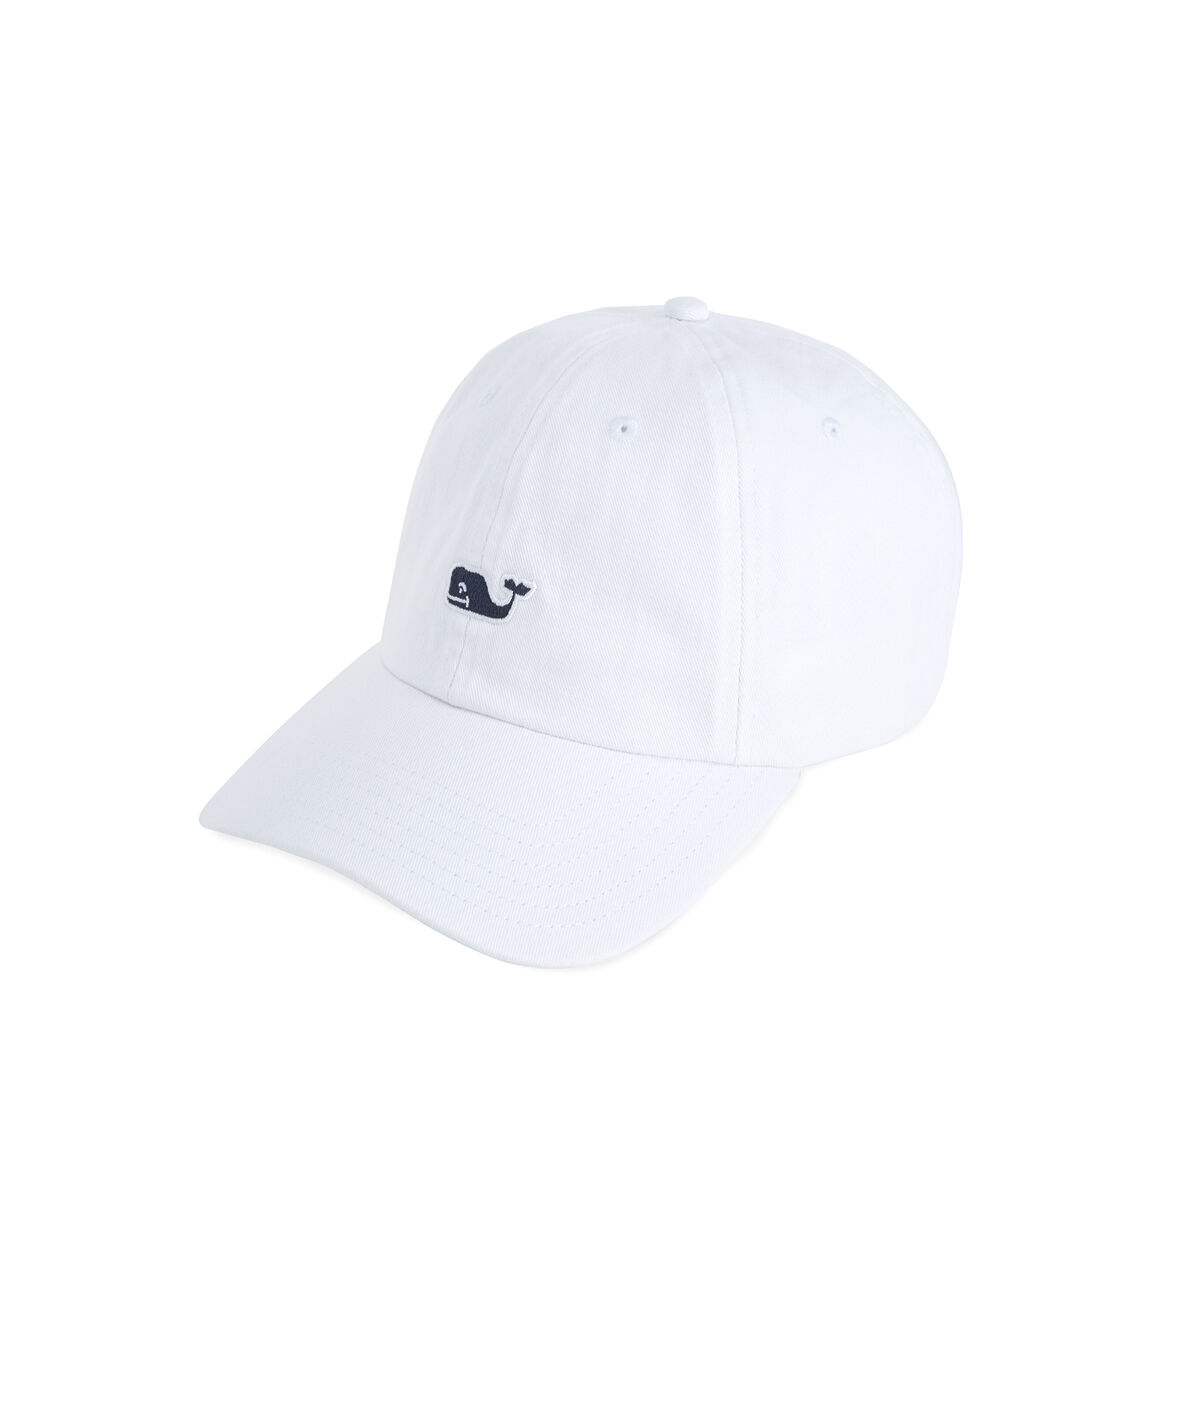 1e6919fe4fc3f Whale Logo Baseball Hat. Zoom In